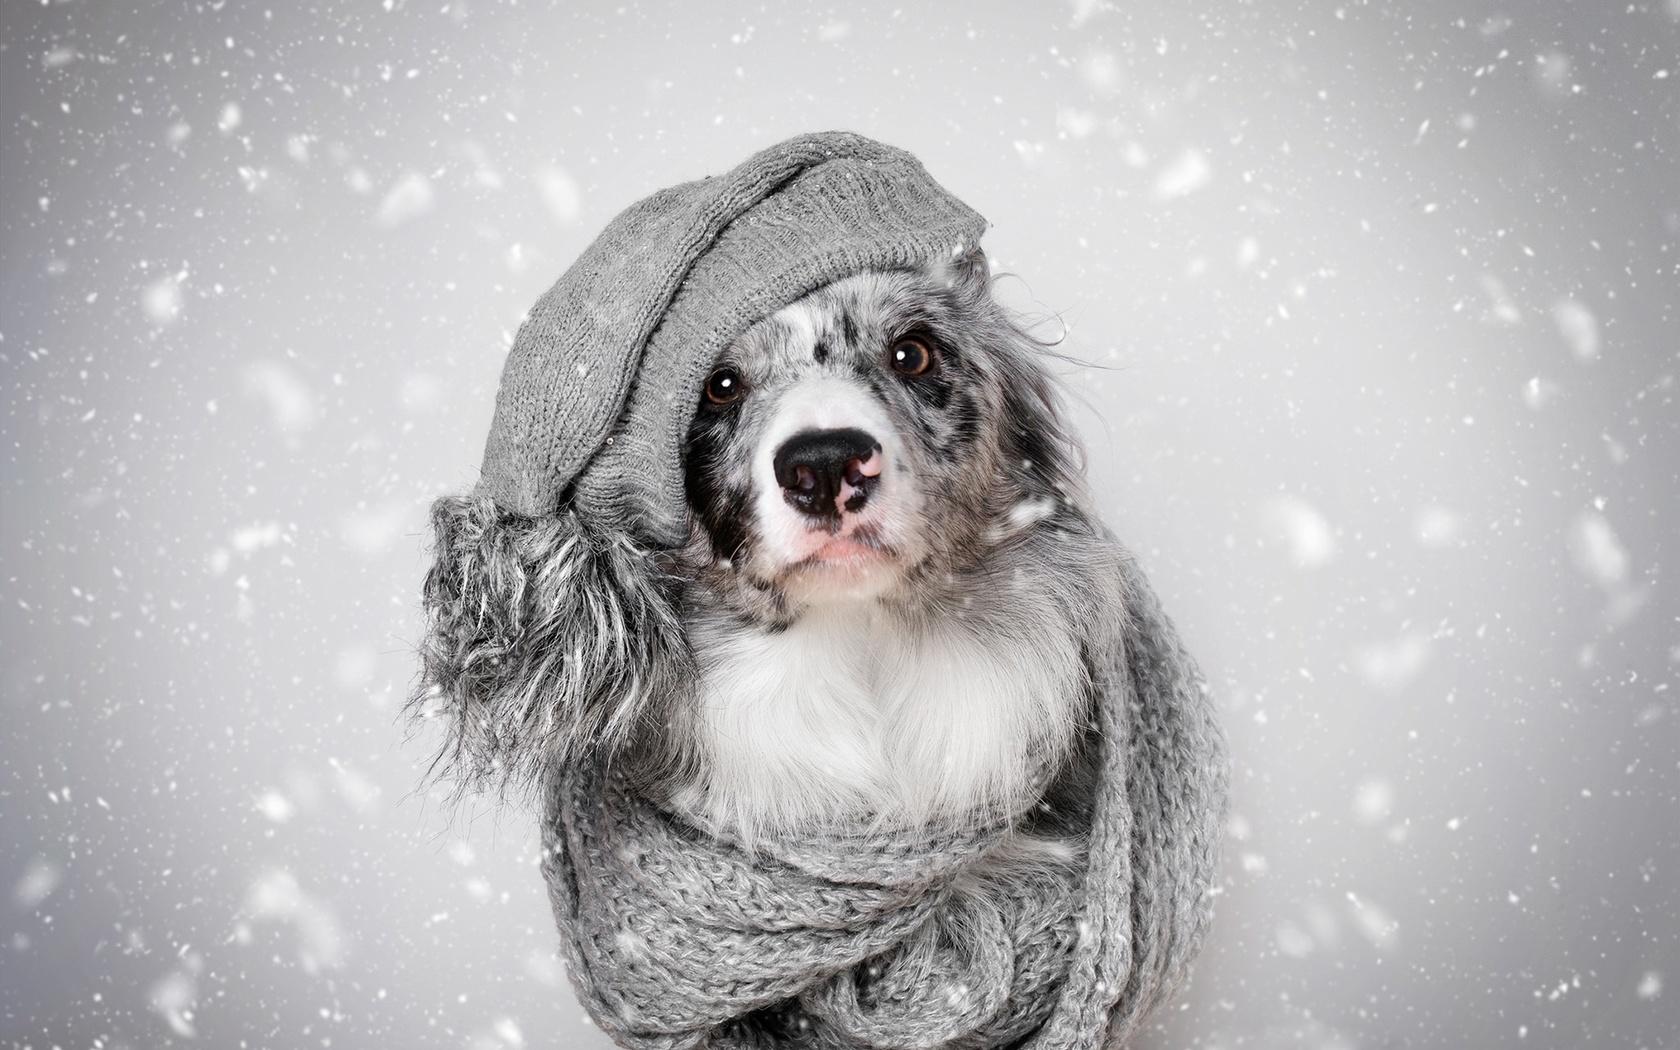 красивые зимние картинки на аватарку с собачками